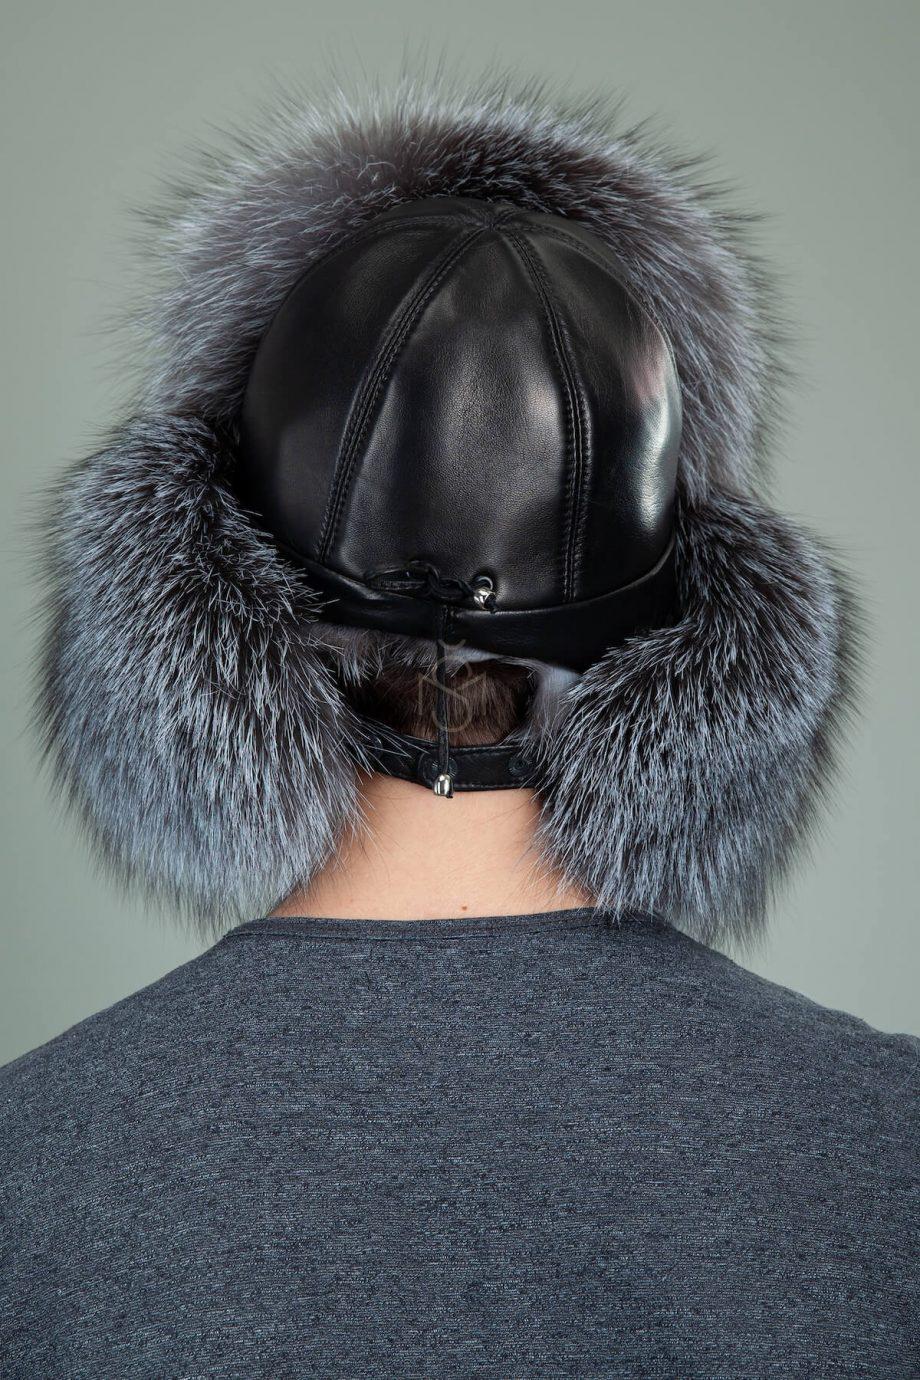 vyriska ausine kepure su juodsidabres lapes kailiu ir oda